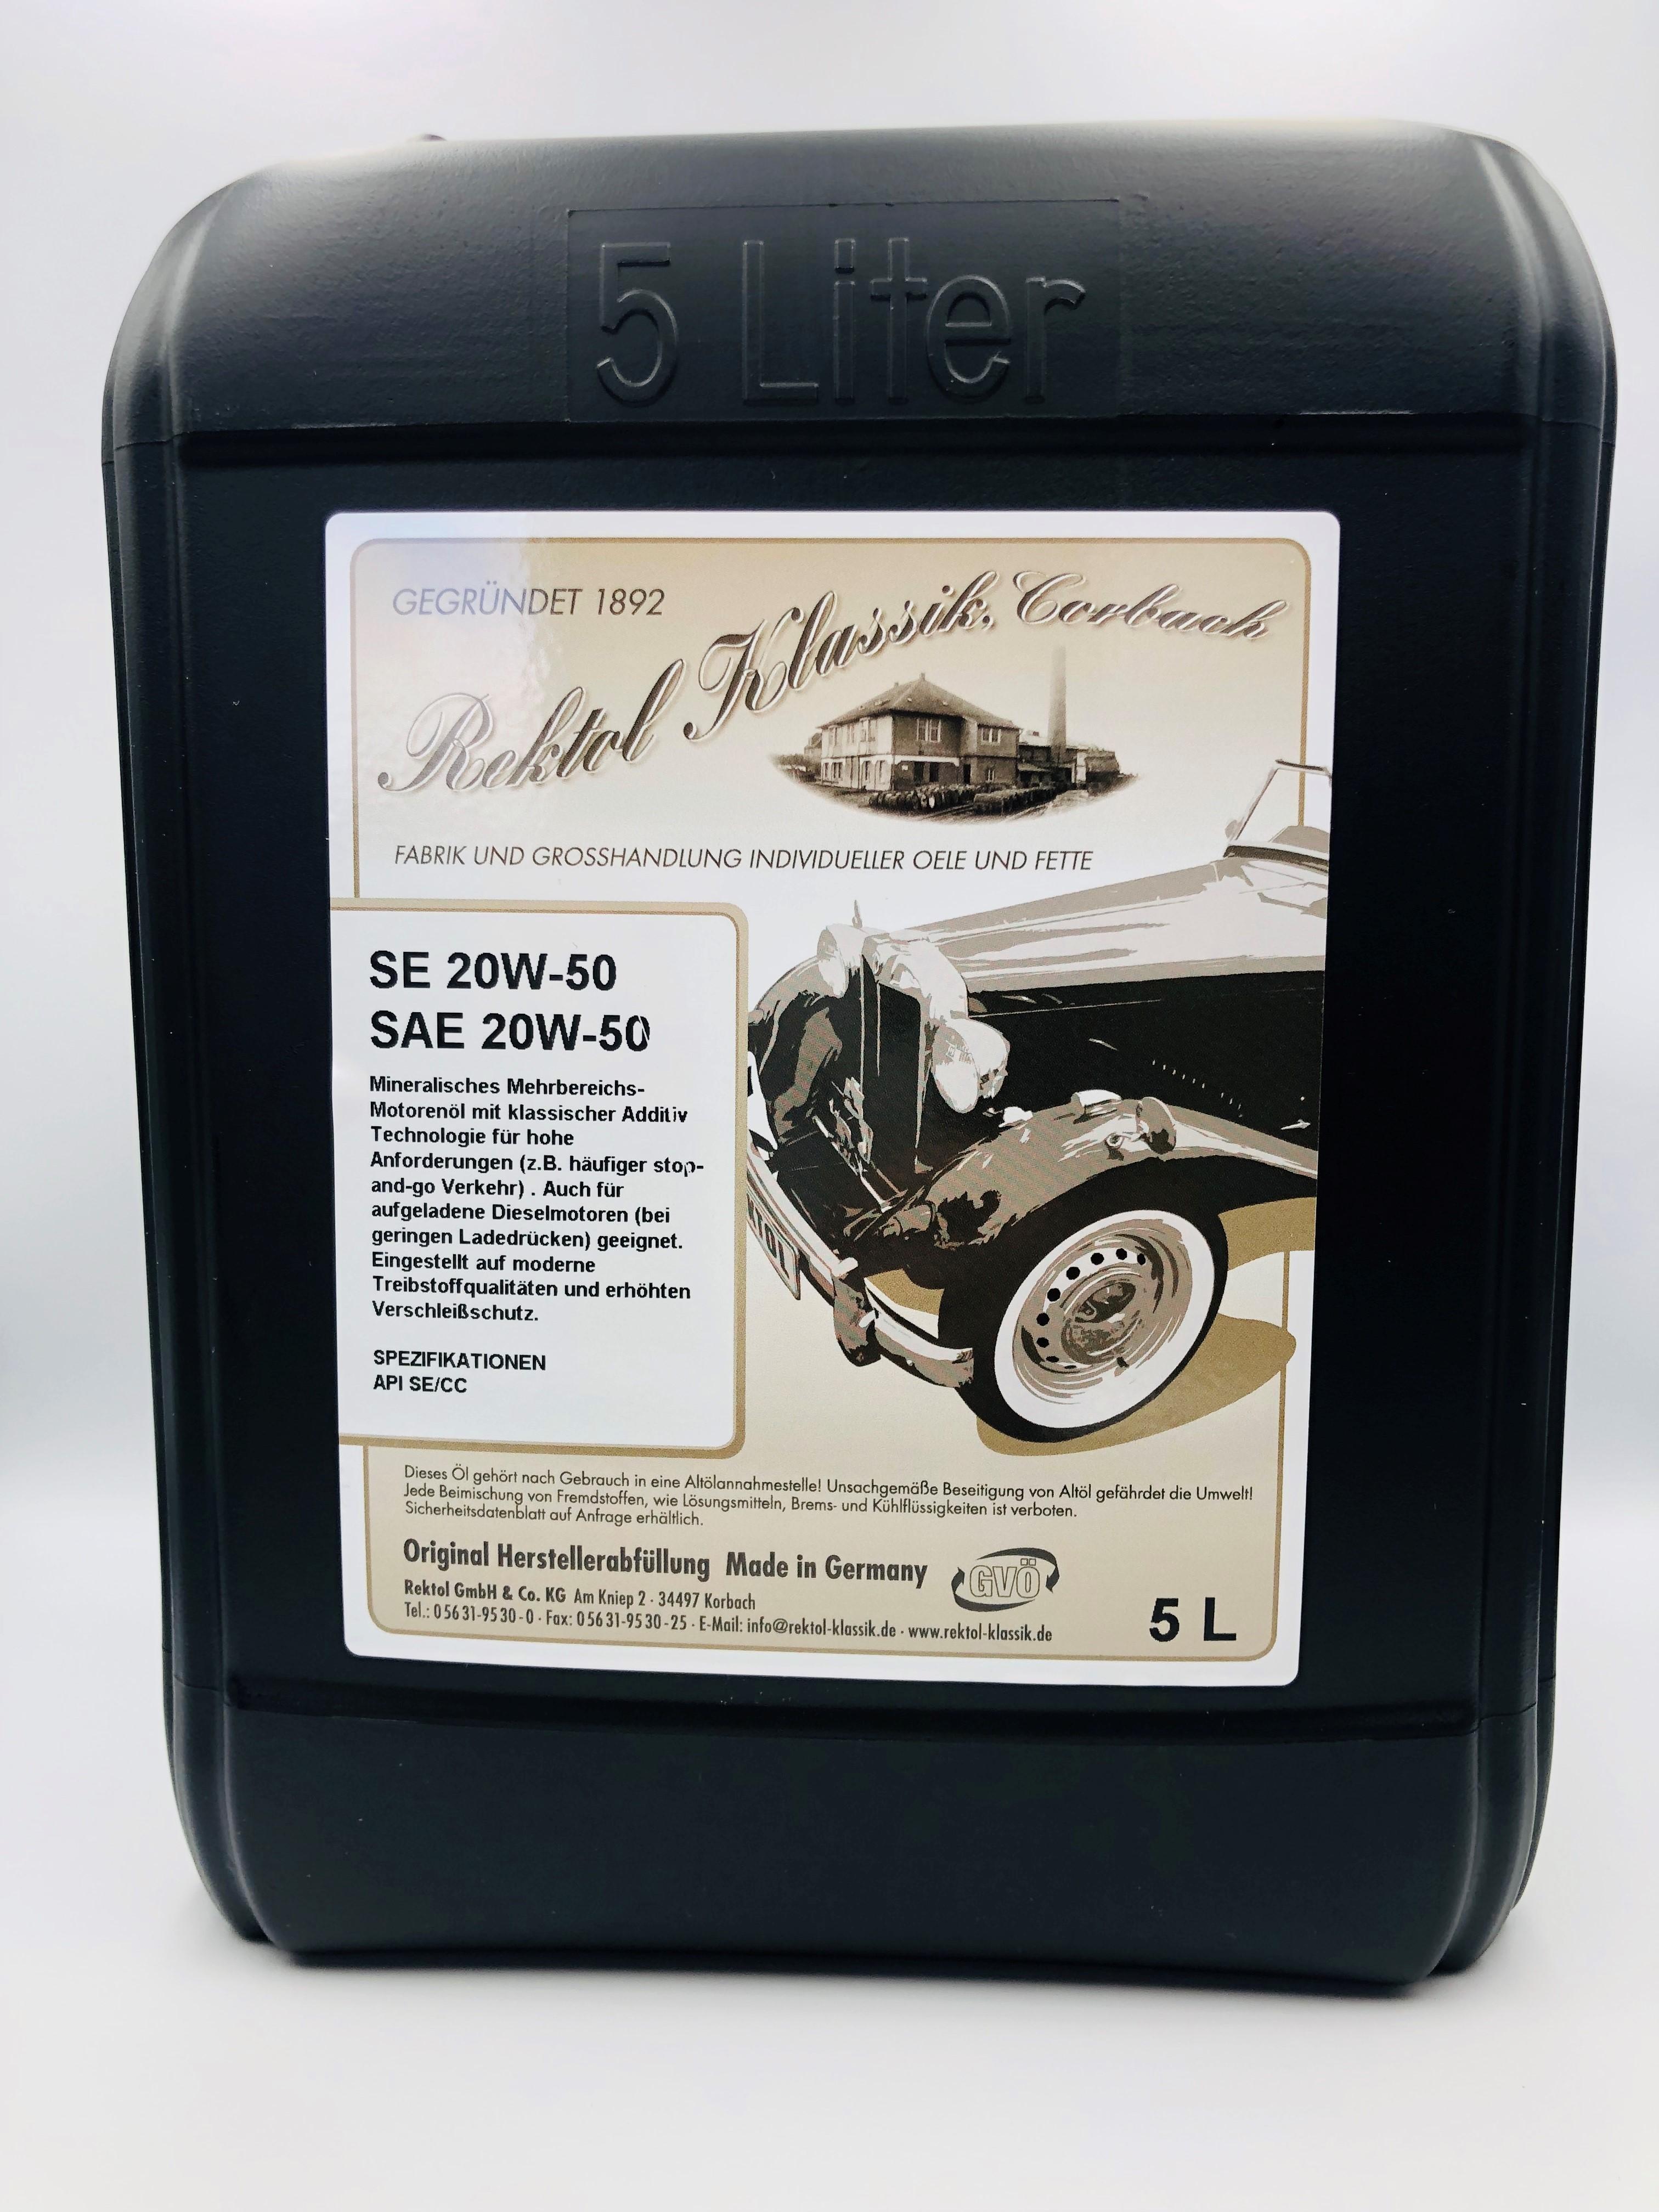 Nye Rektol Klassik SE 20w50 - 5 Liter PB-86